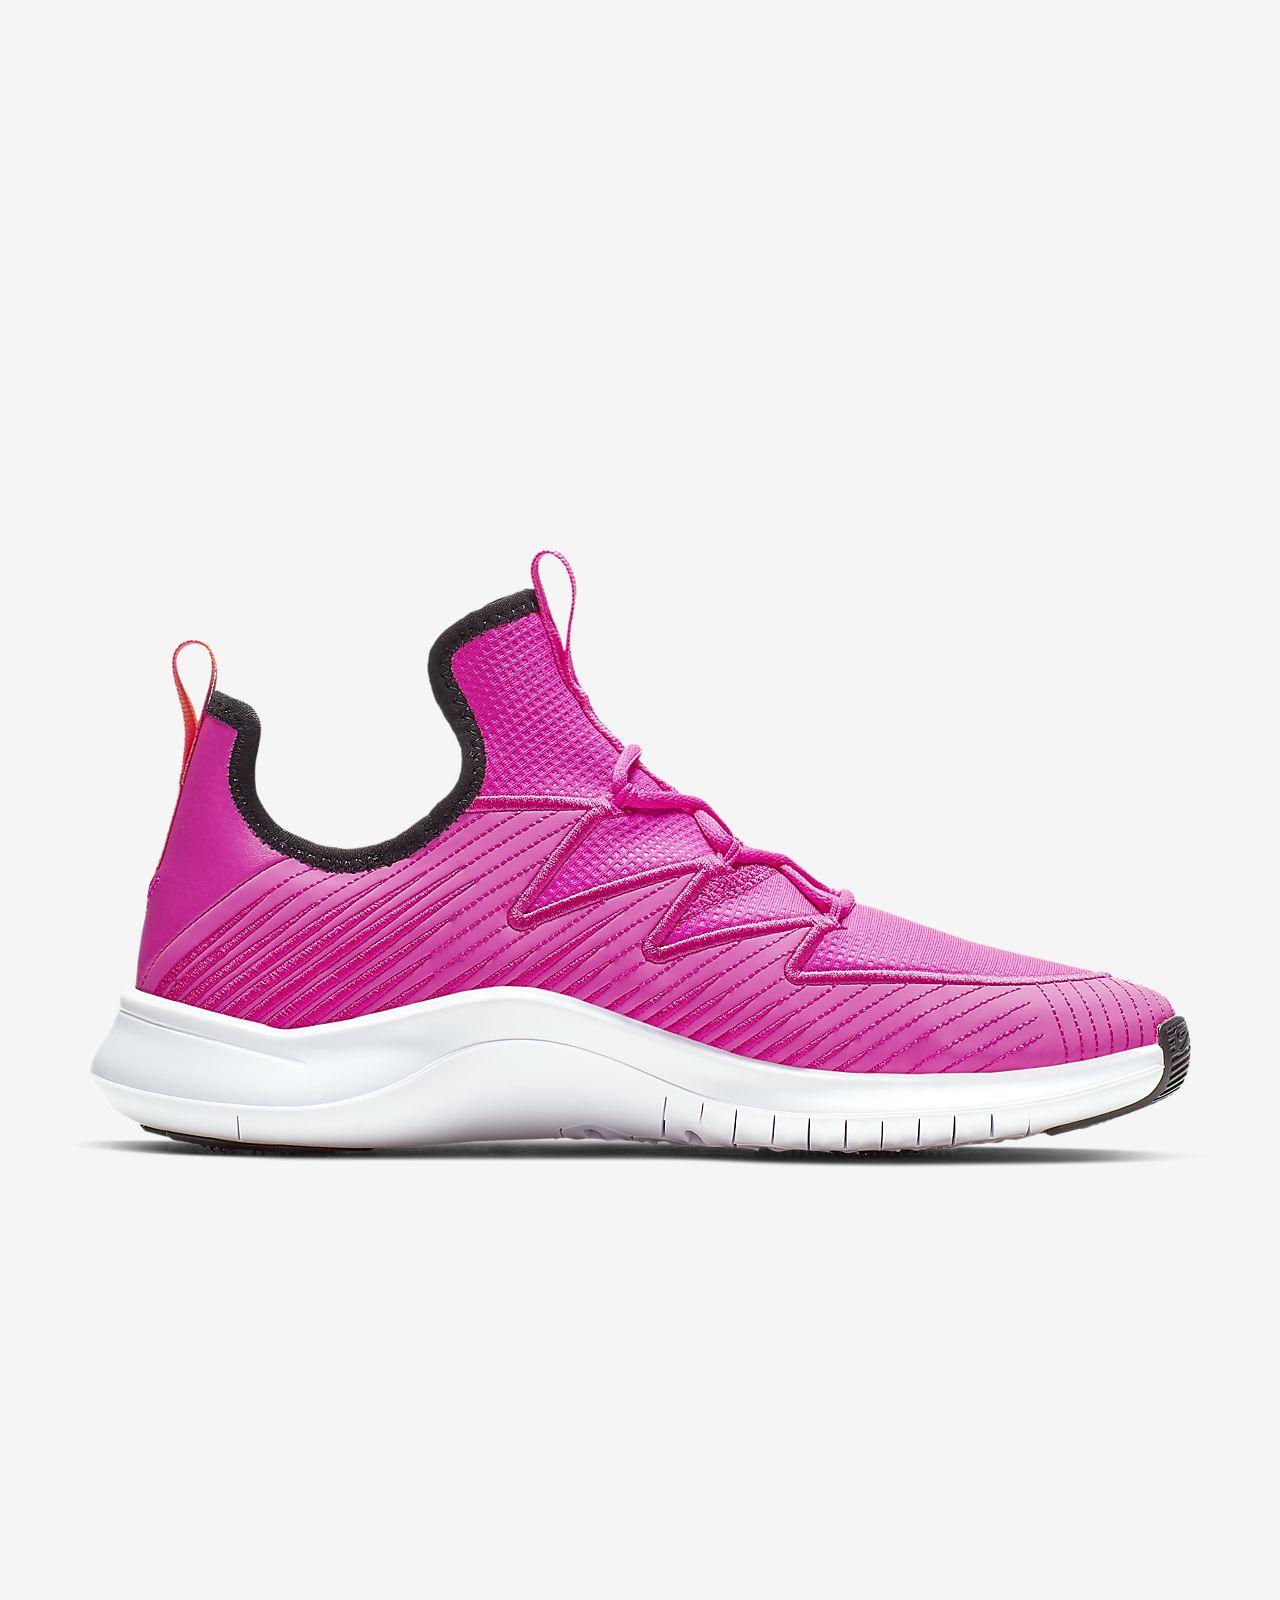 22a715f74b4 Nike Free TR Ultra Women s Training Shoe. Nike.com AU